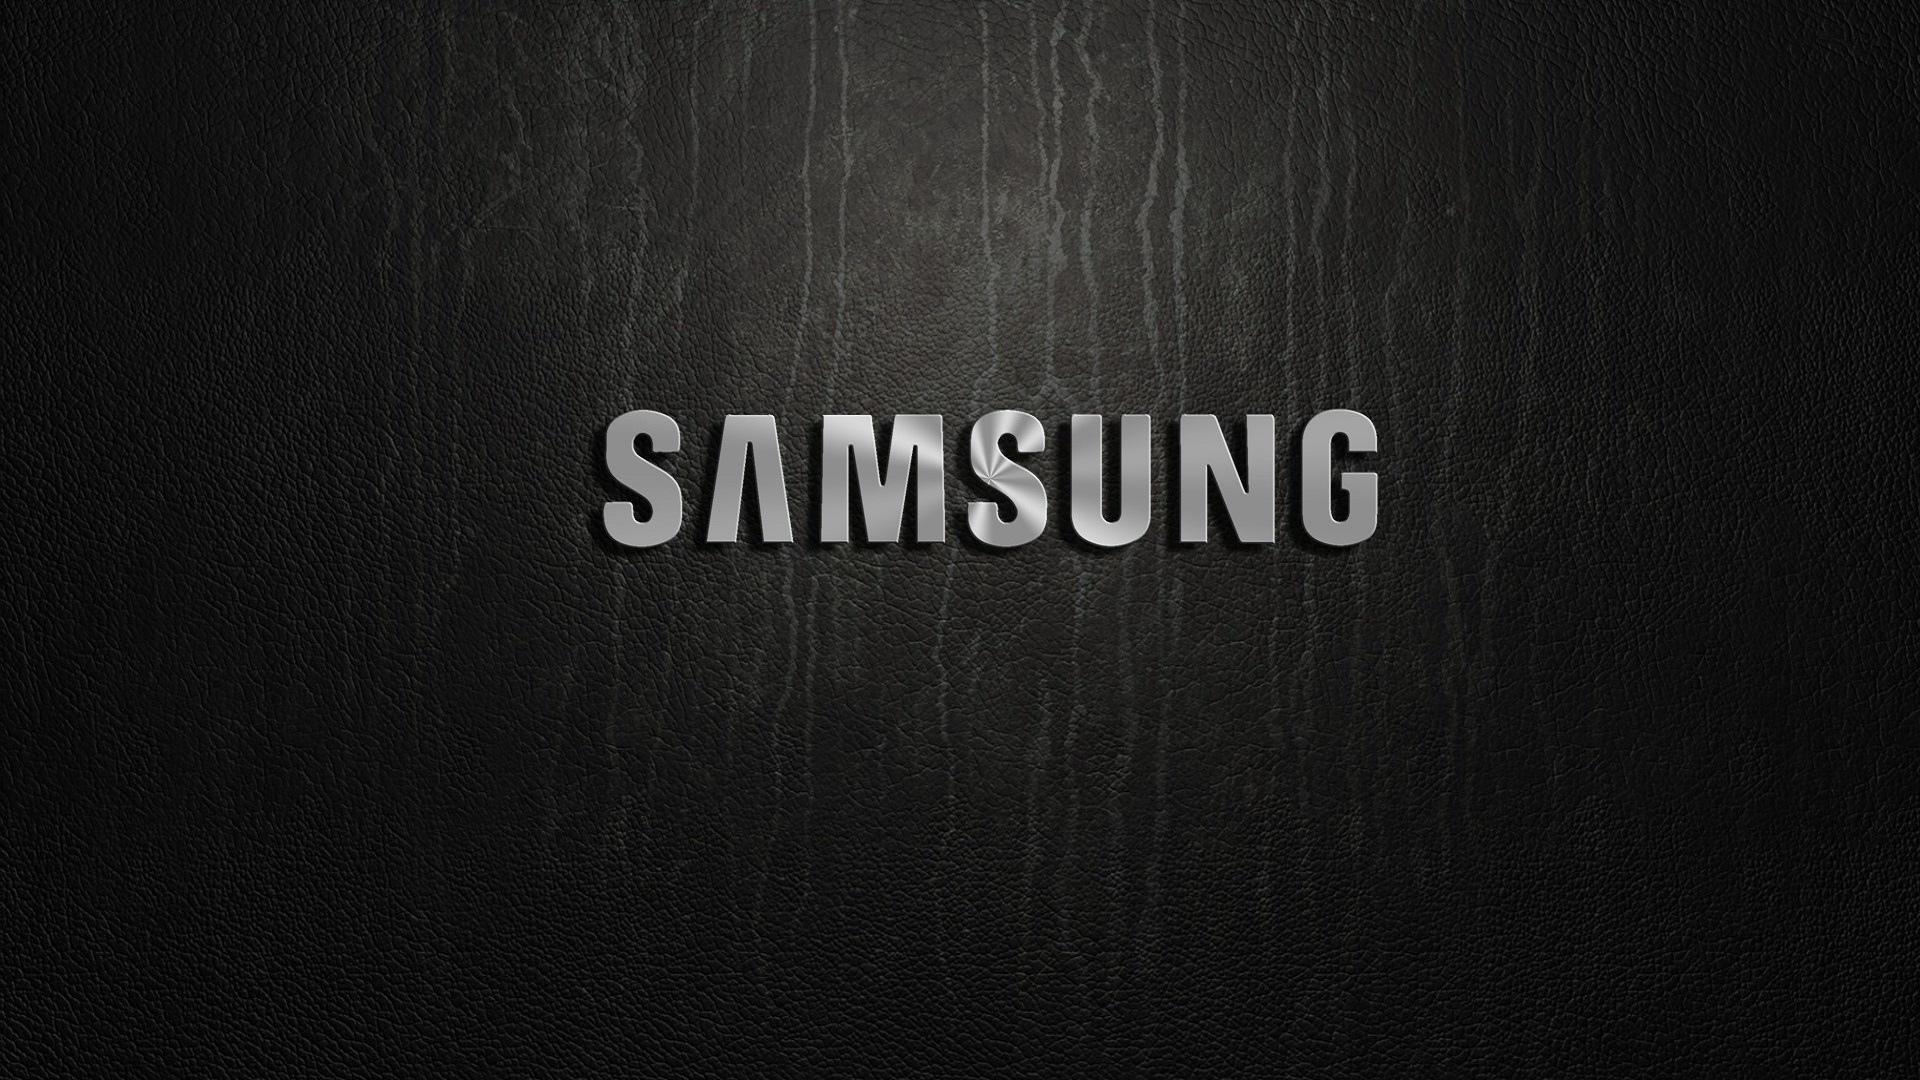 Samsung logo wallpaper, Самсунг логотип, бренды, 1920 на 1080 пикселей